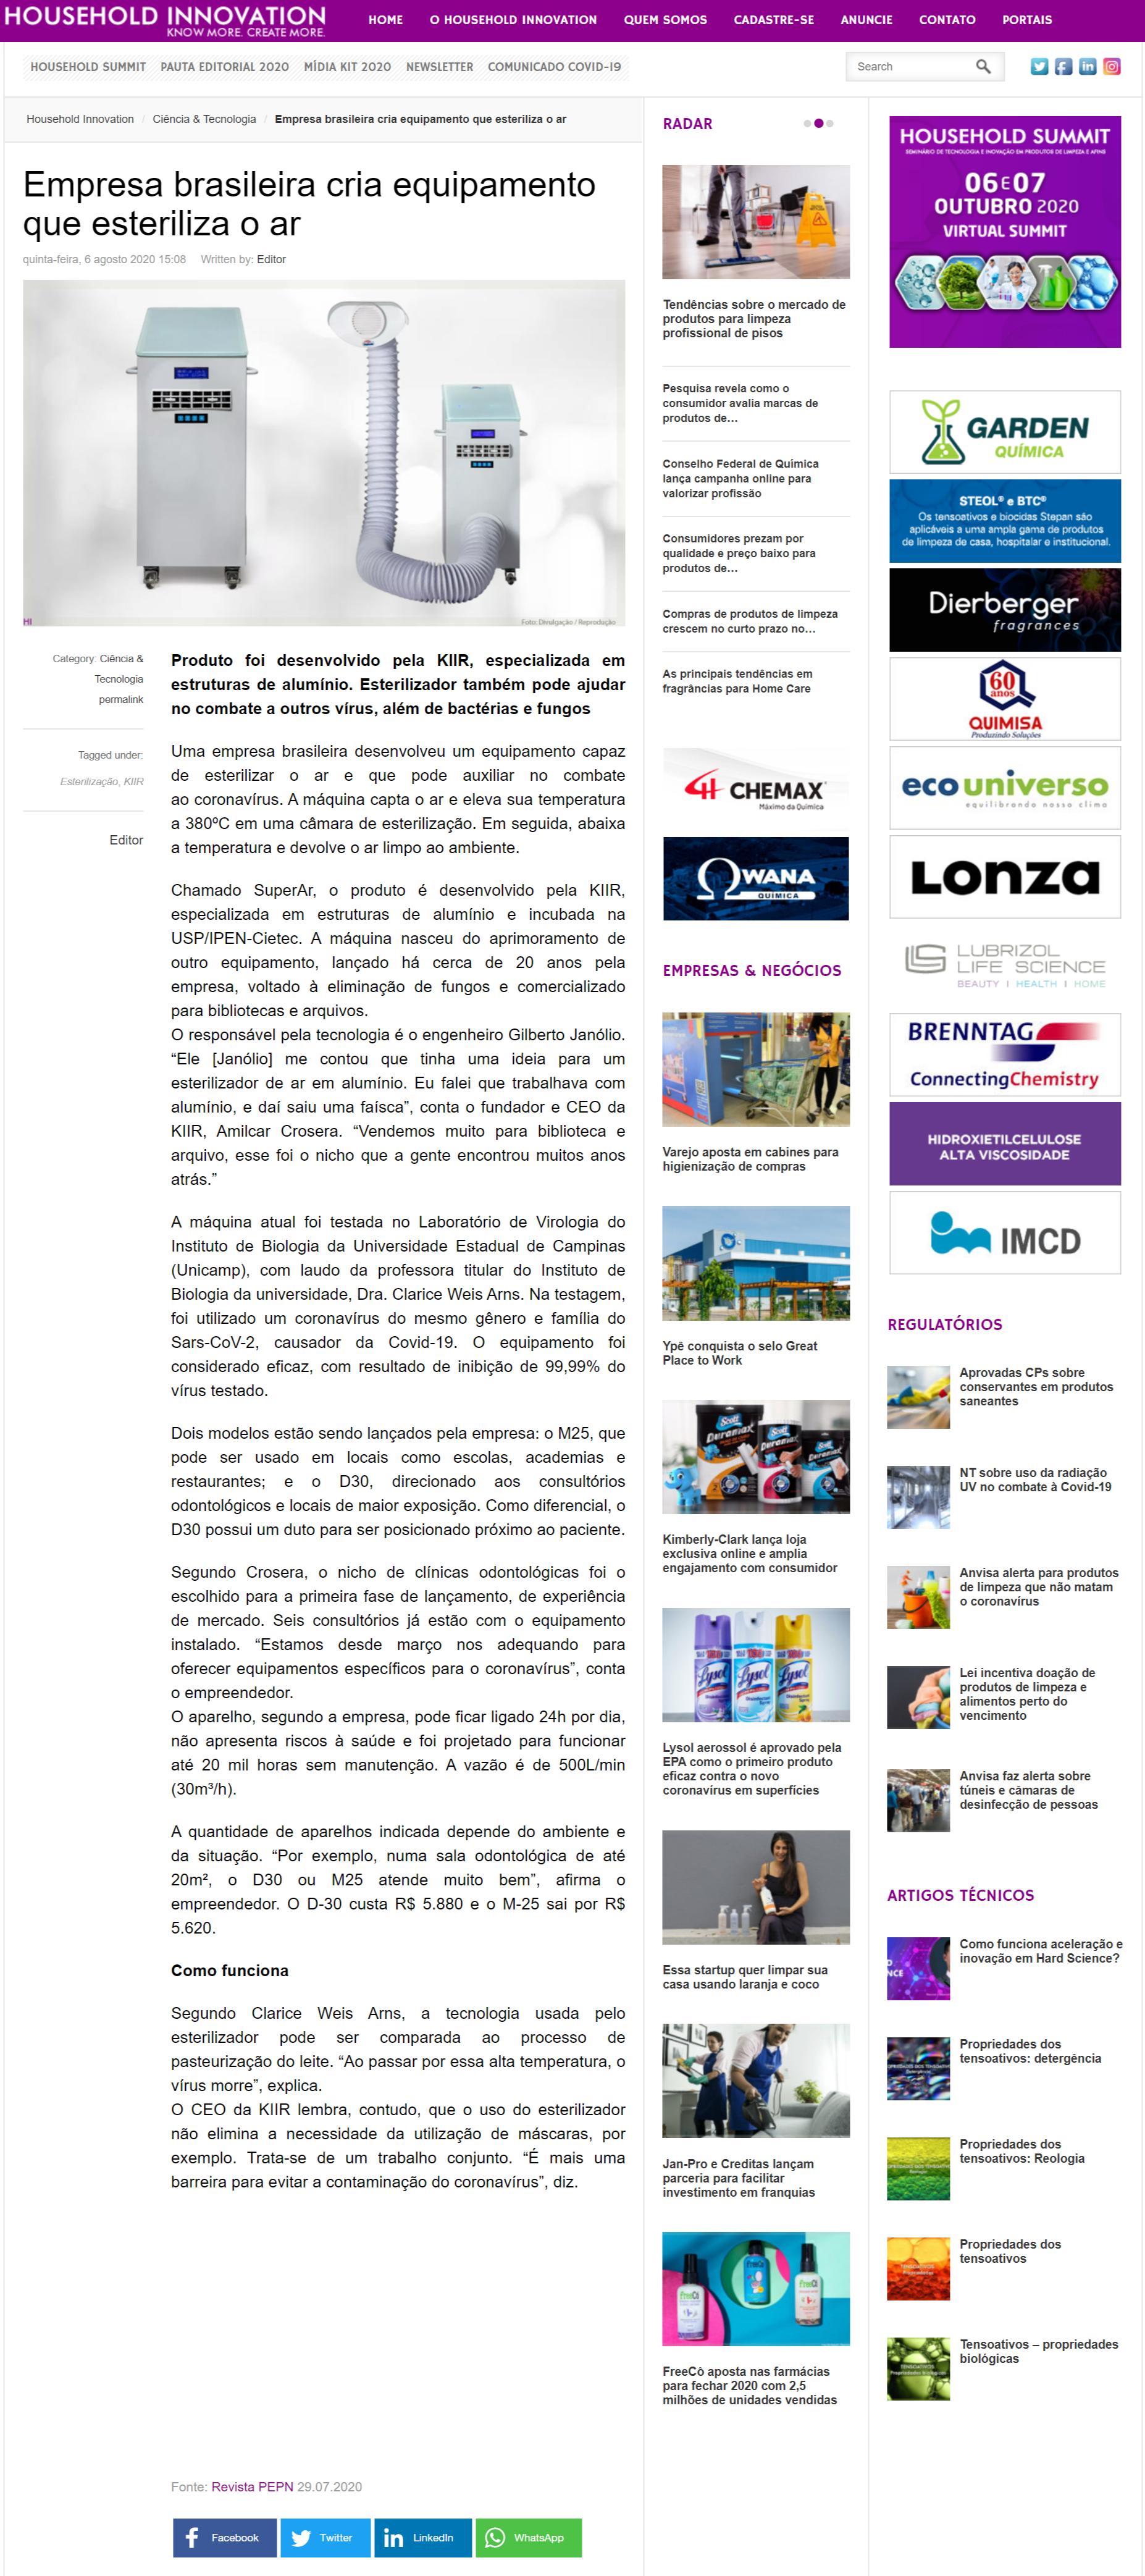 Empresa brasileira cria equipamento que esteriliza o ar - Household Innovation